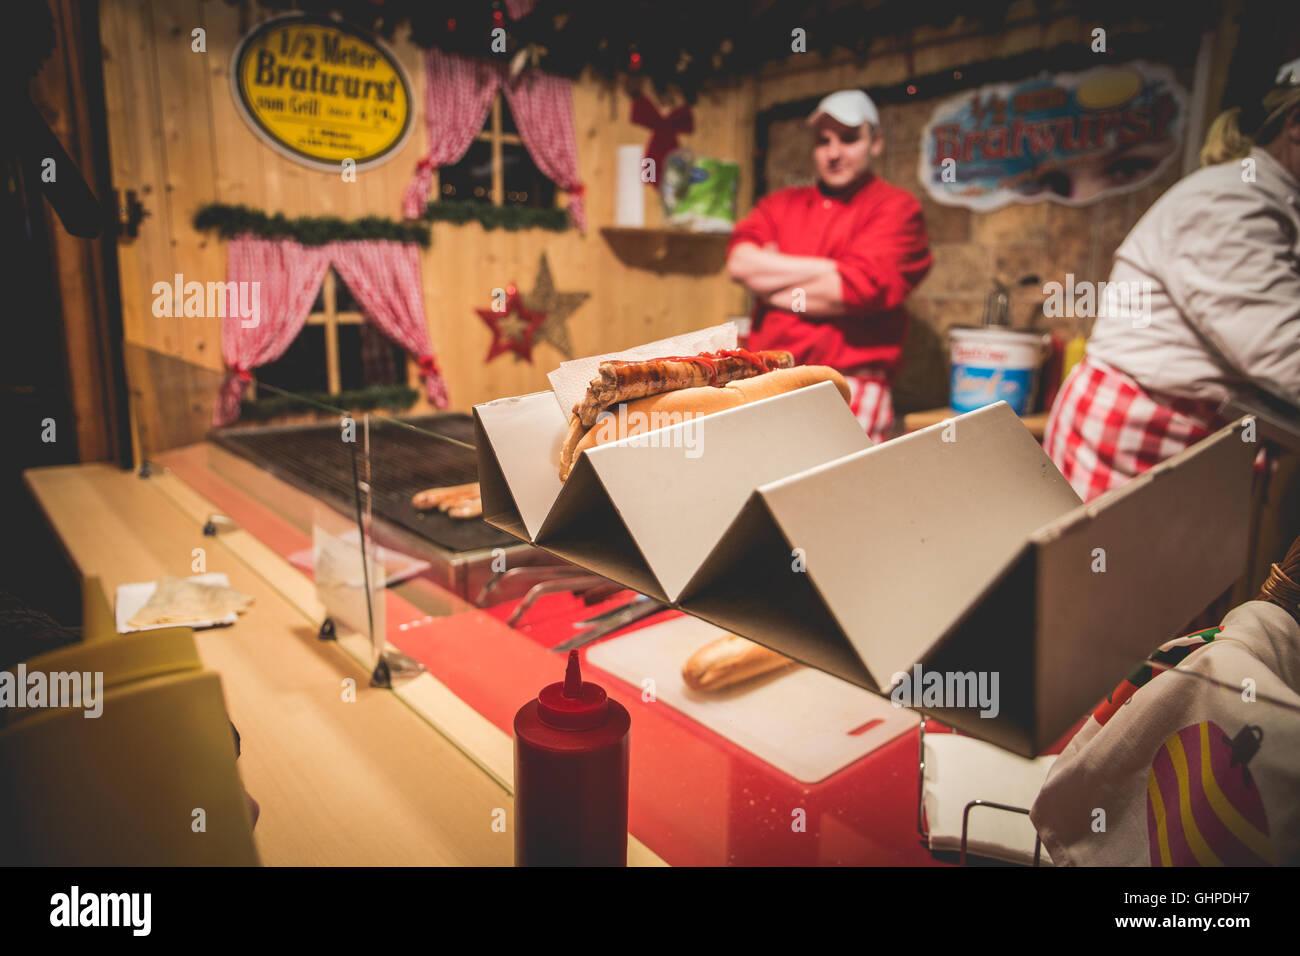 Germany traditional Bratwurst stall at Berliner Weihnachtsmarkt. - Stock Image